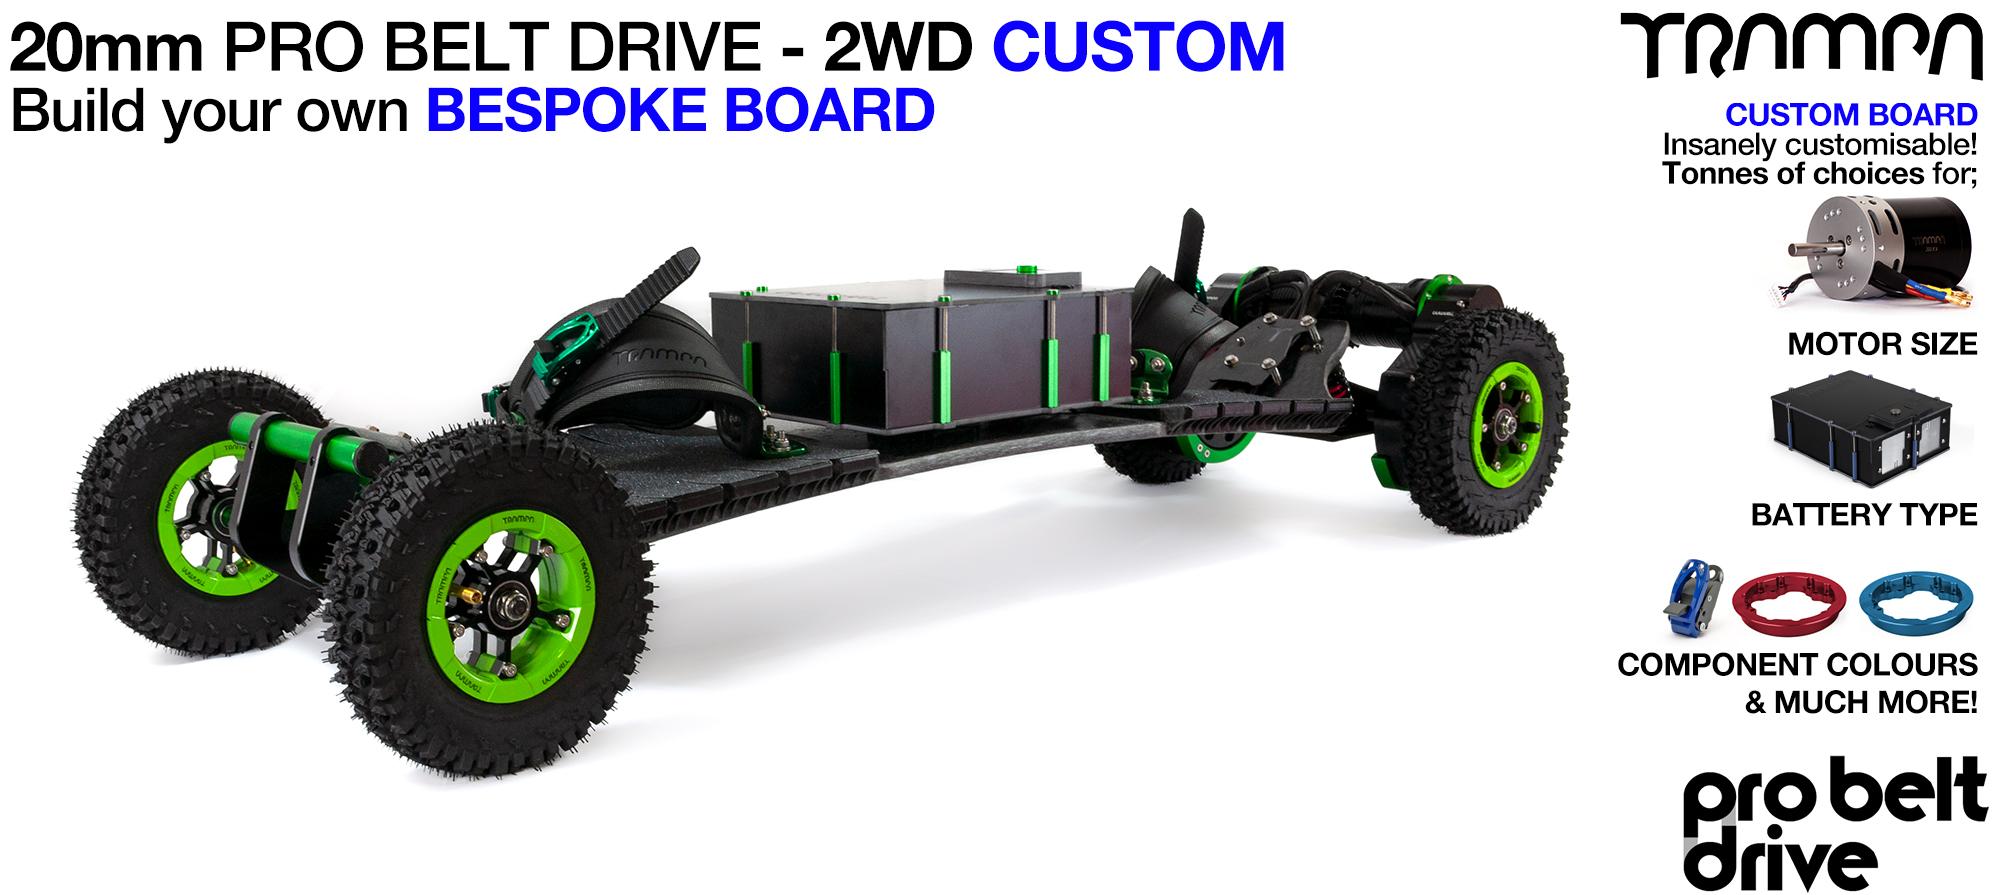 Electric Mountainboard with 20mm PRO BELT DRIVE Motor mounts - 2WD CUSTOM